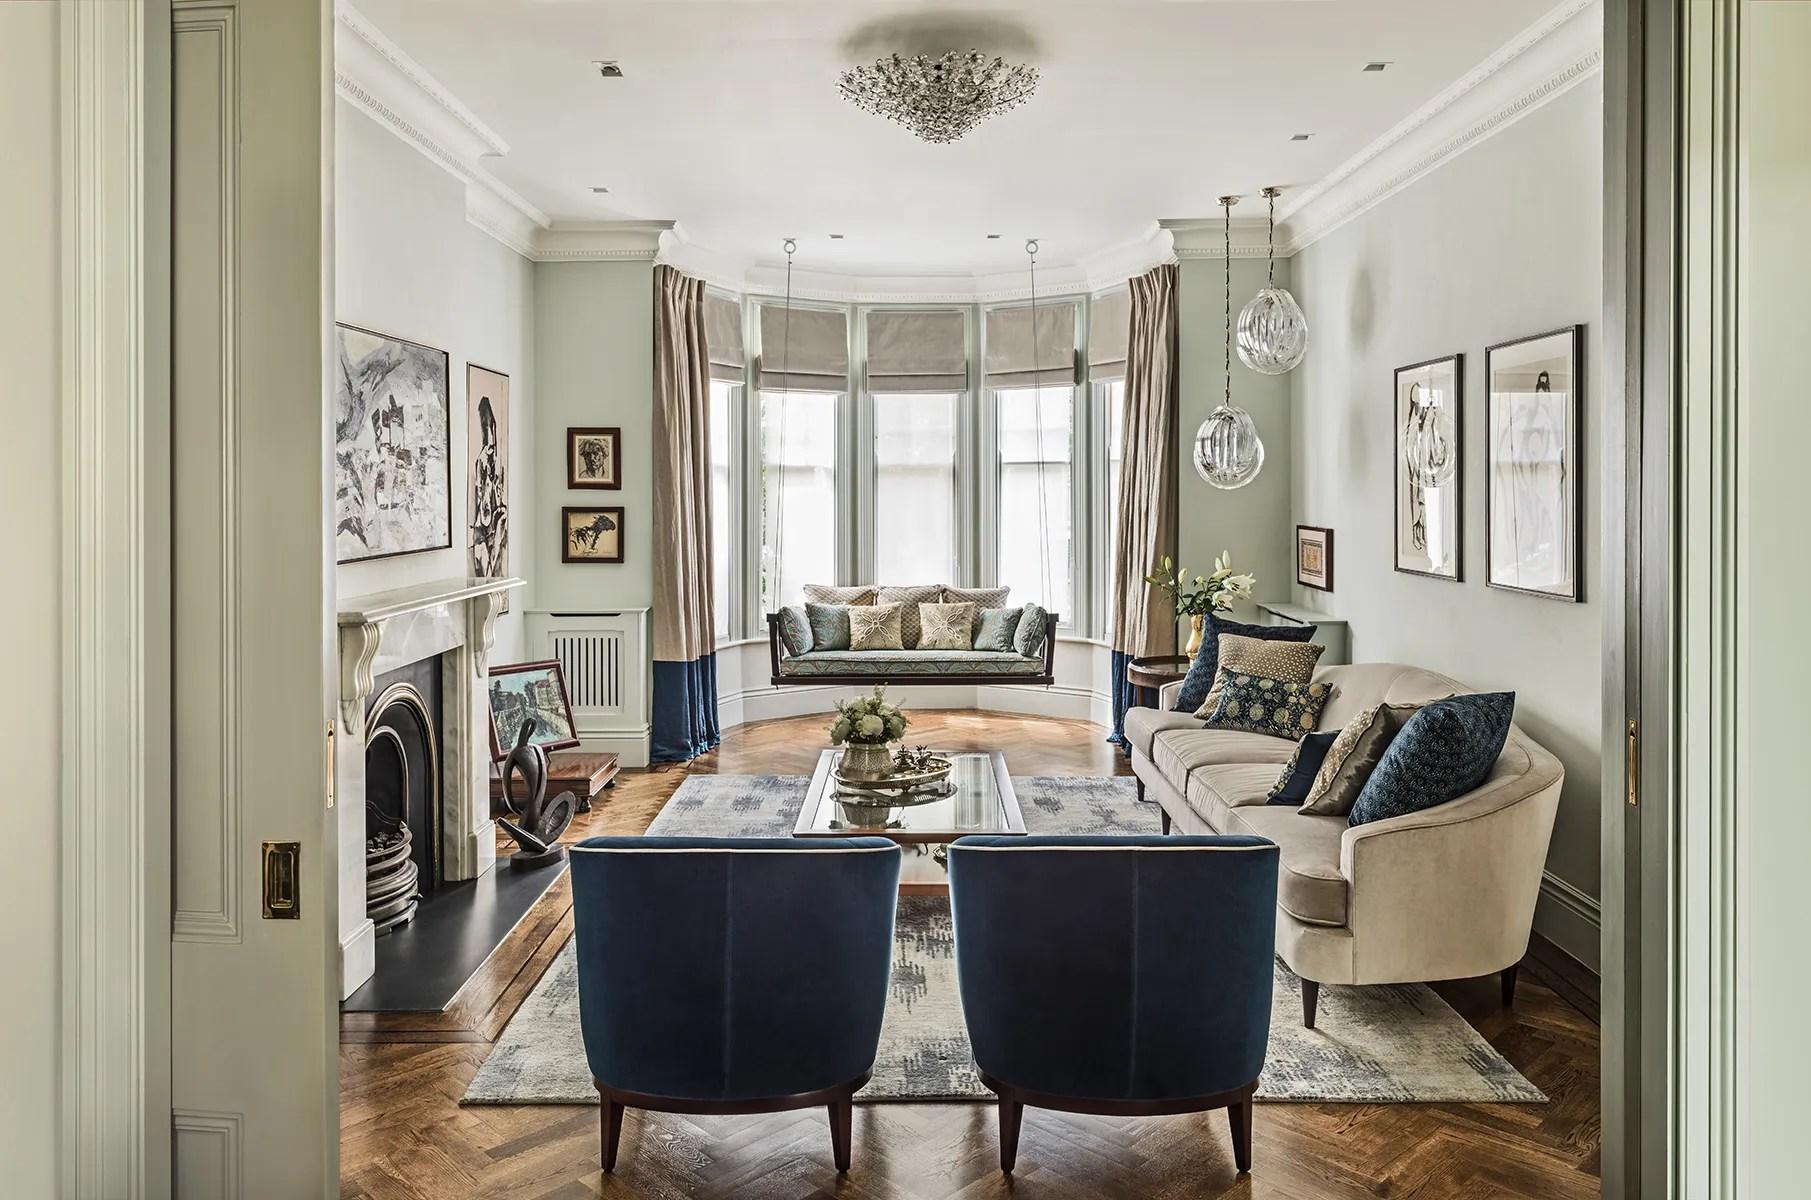 top 12 interior design living room ideas from the best uk interior rh interiorstylehunter com Formal Dining Room Decorating Ideas Dining Room Wall Decor